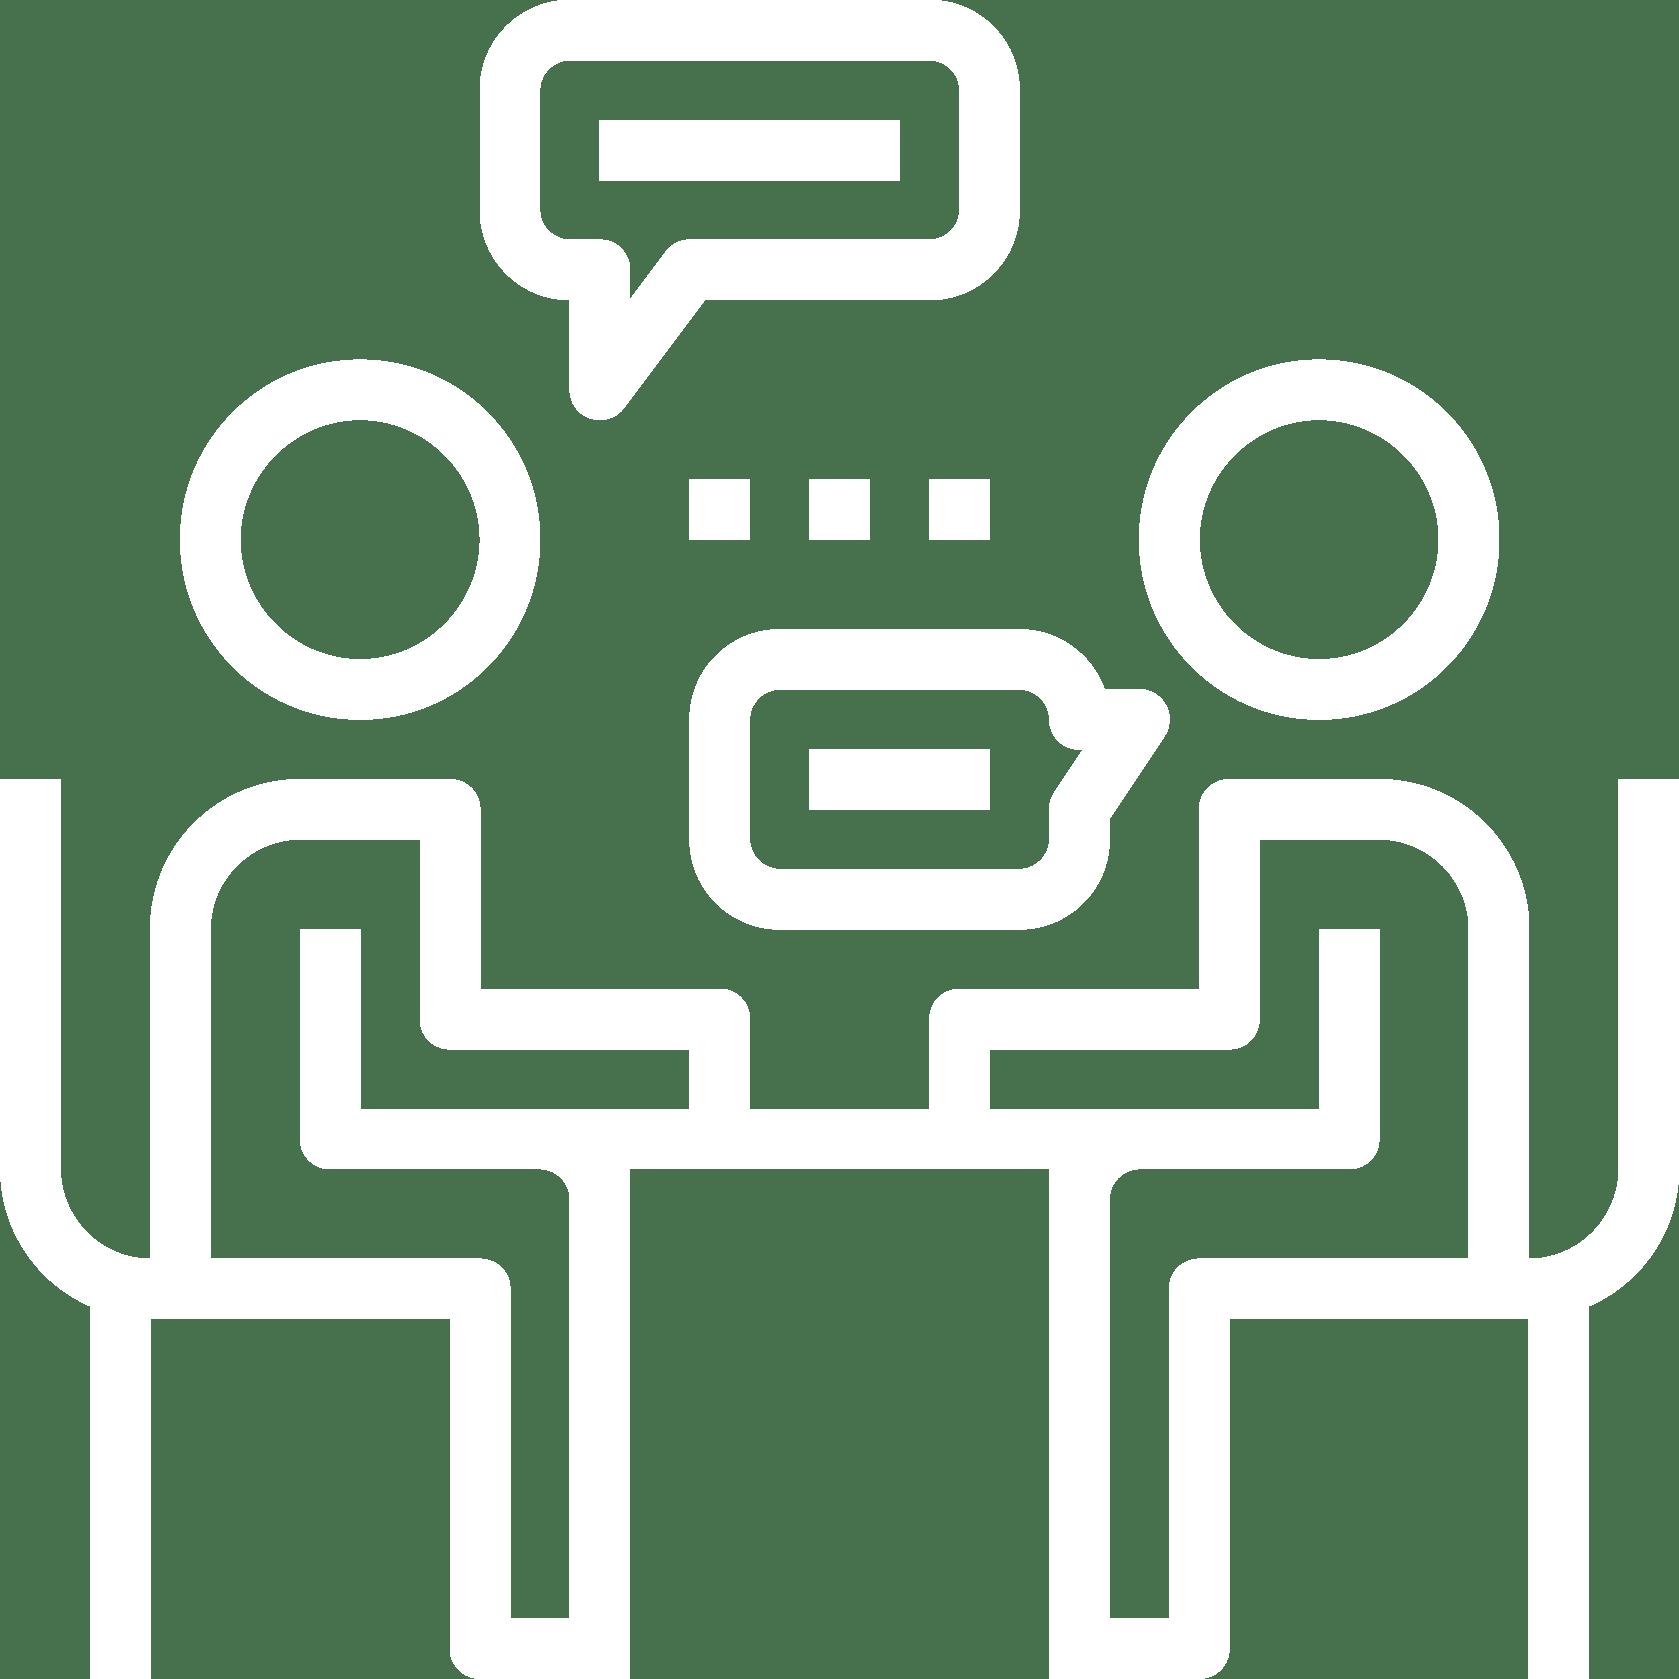 Logo conversation